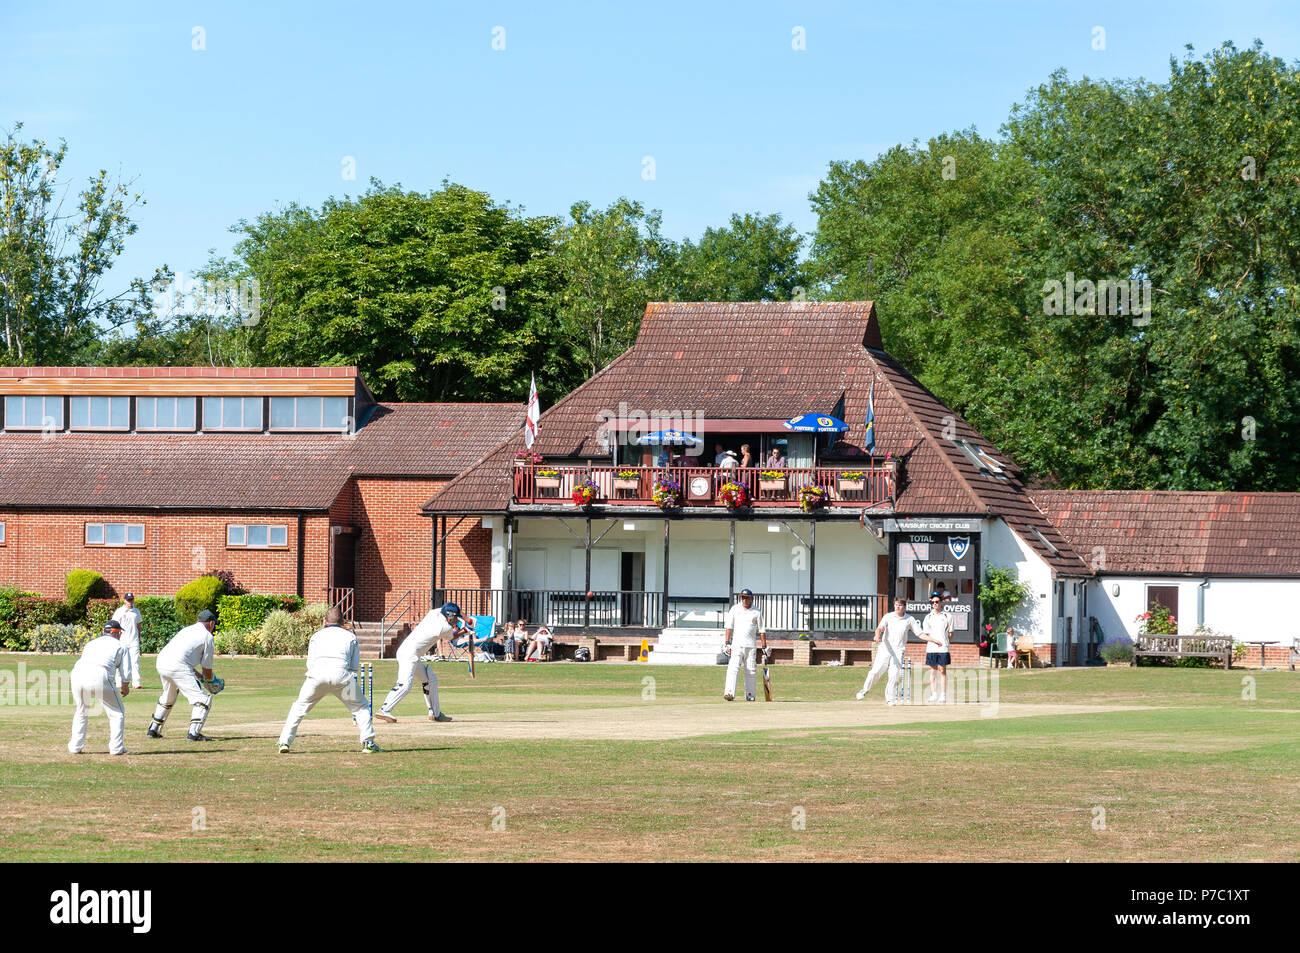 Cricket match at Waysbury Cricket Club, The Green, Wraysbury, Berkshire, England, United Kingdom - Stock Image